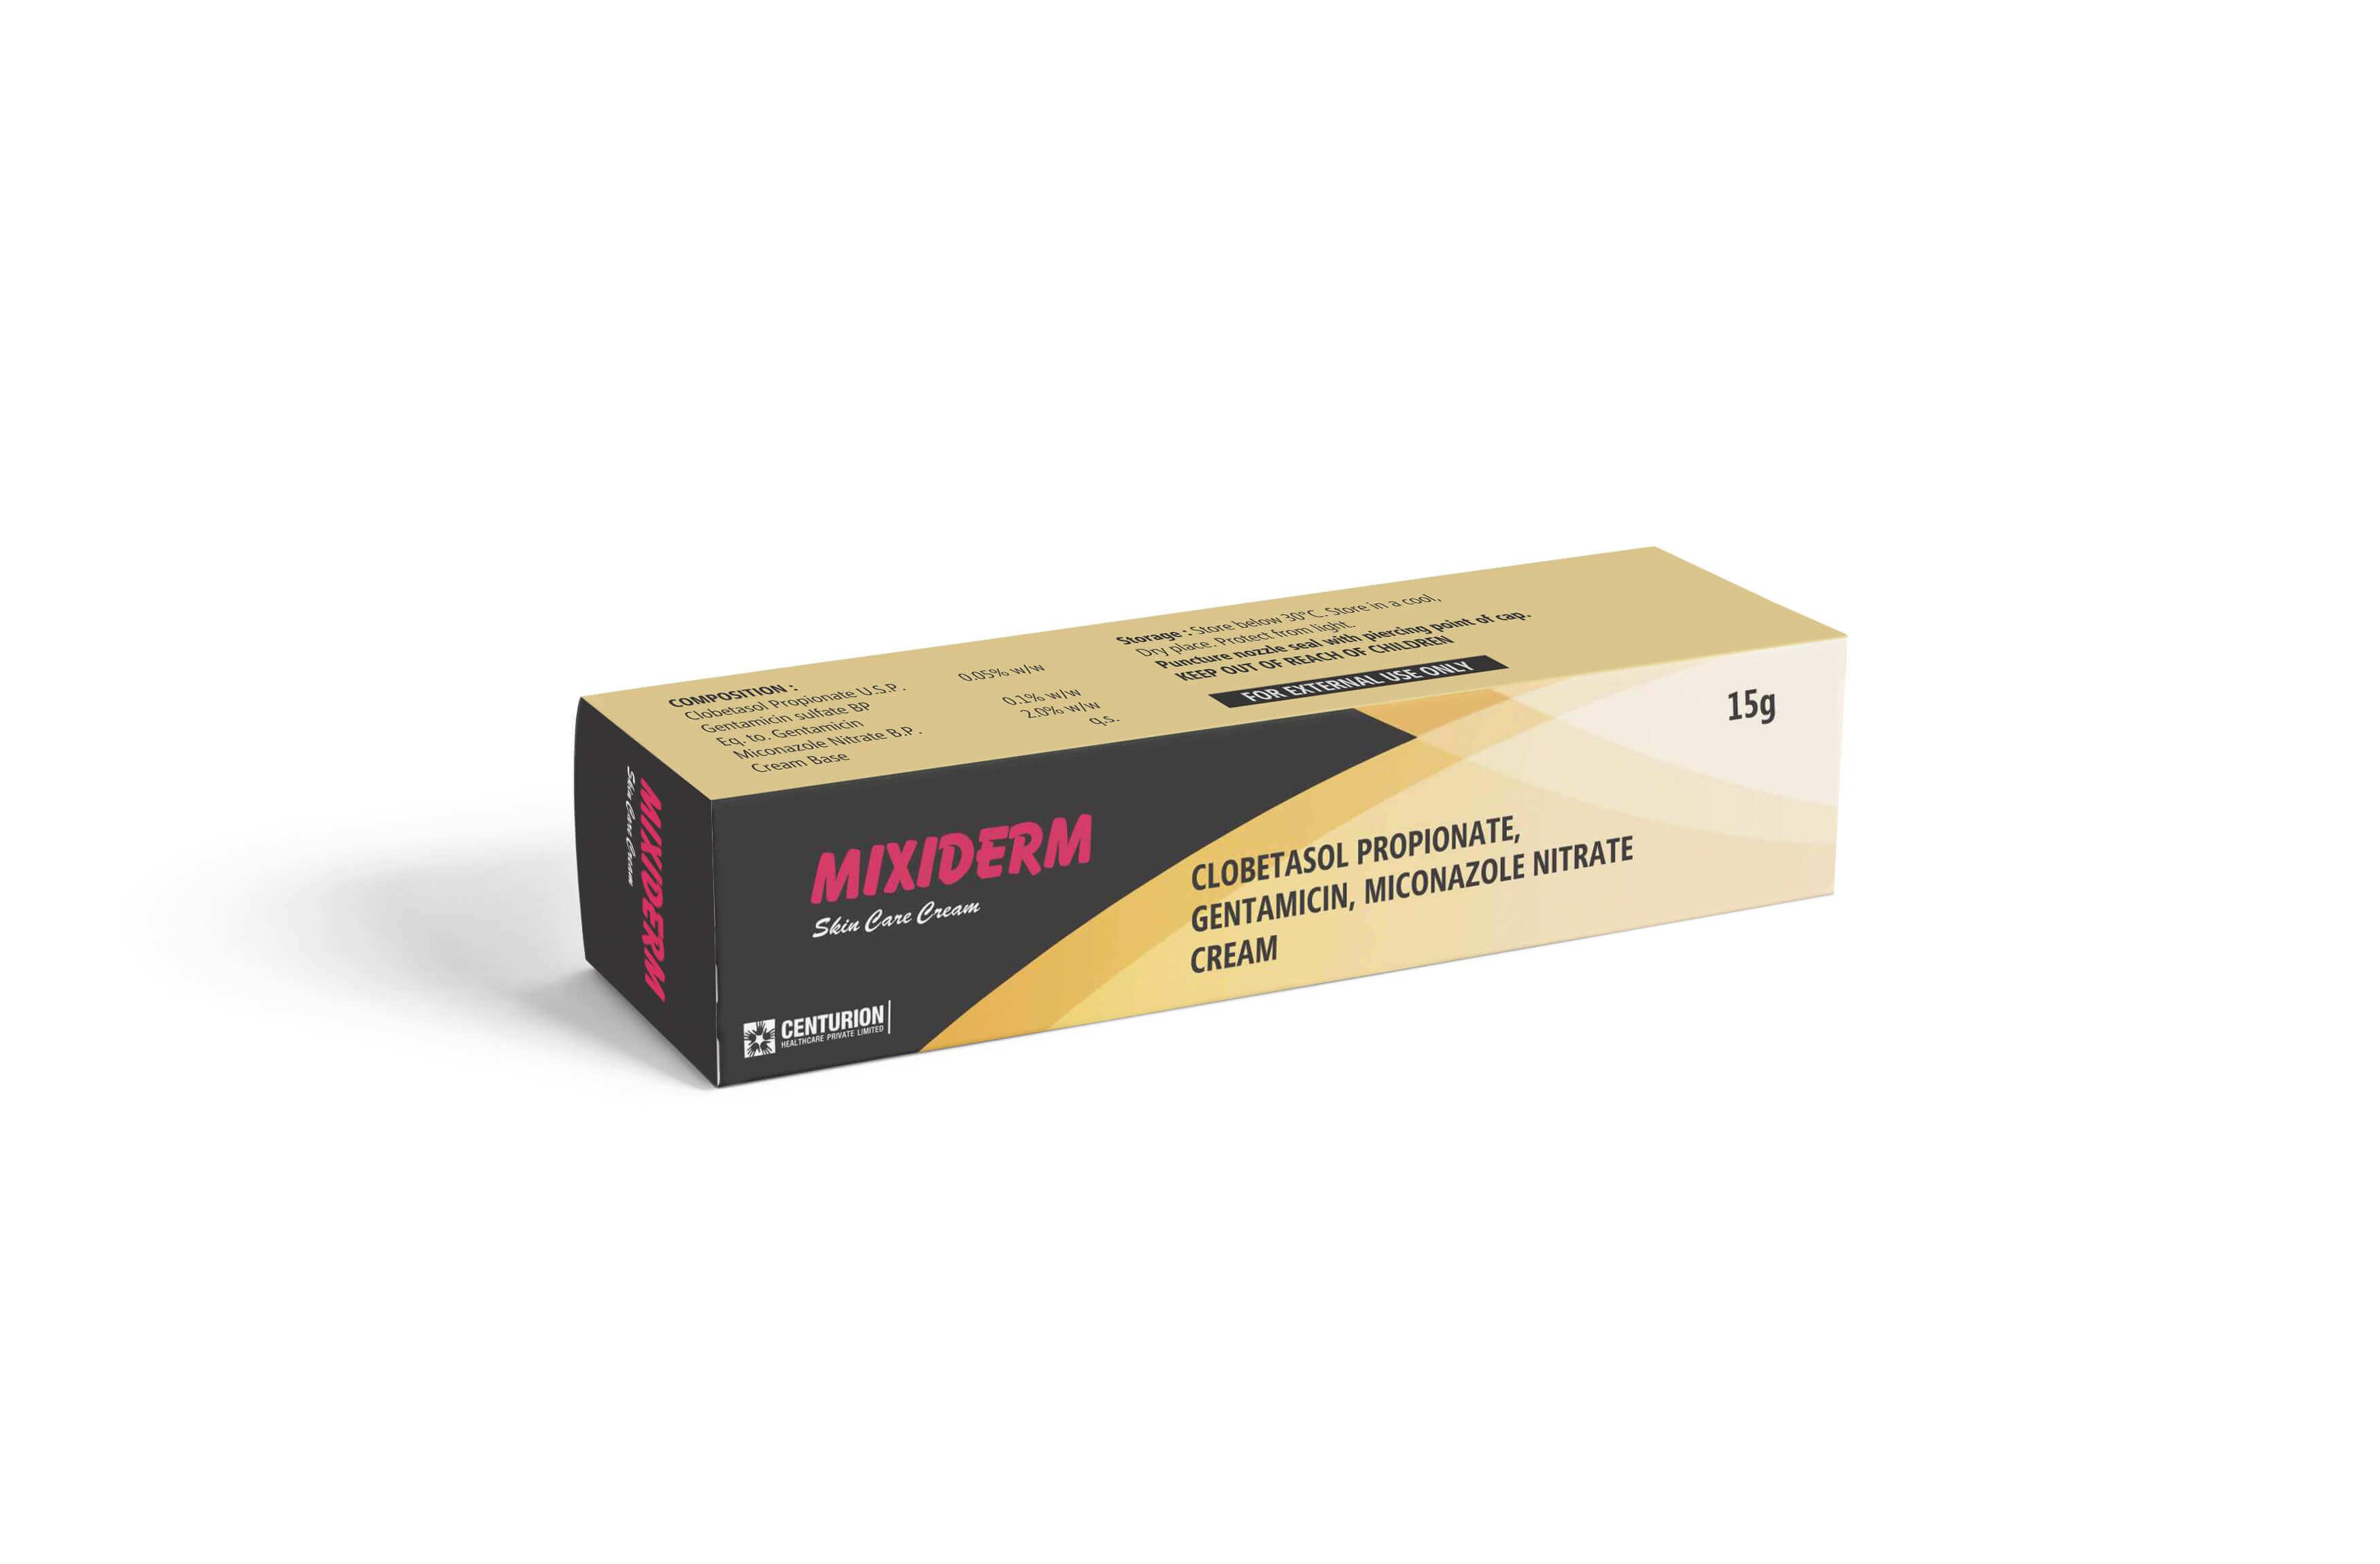 Mixiderm Cream